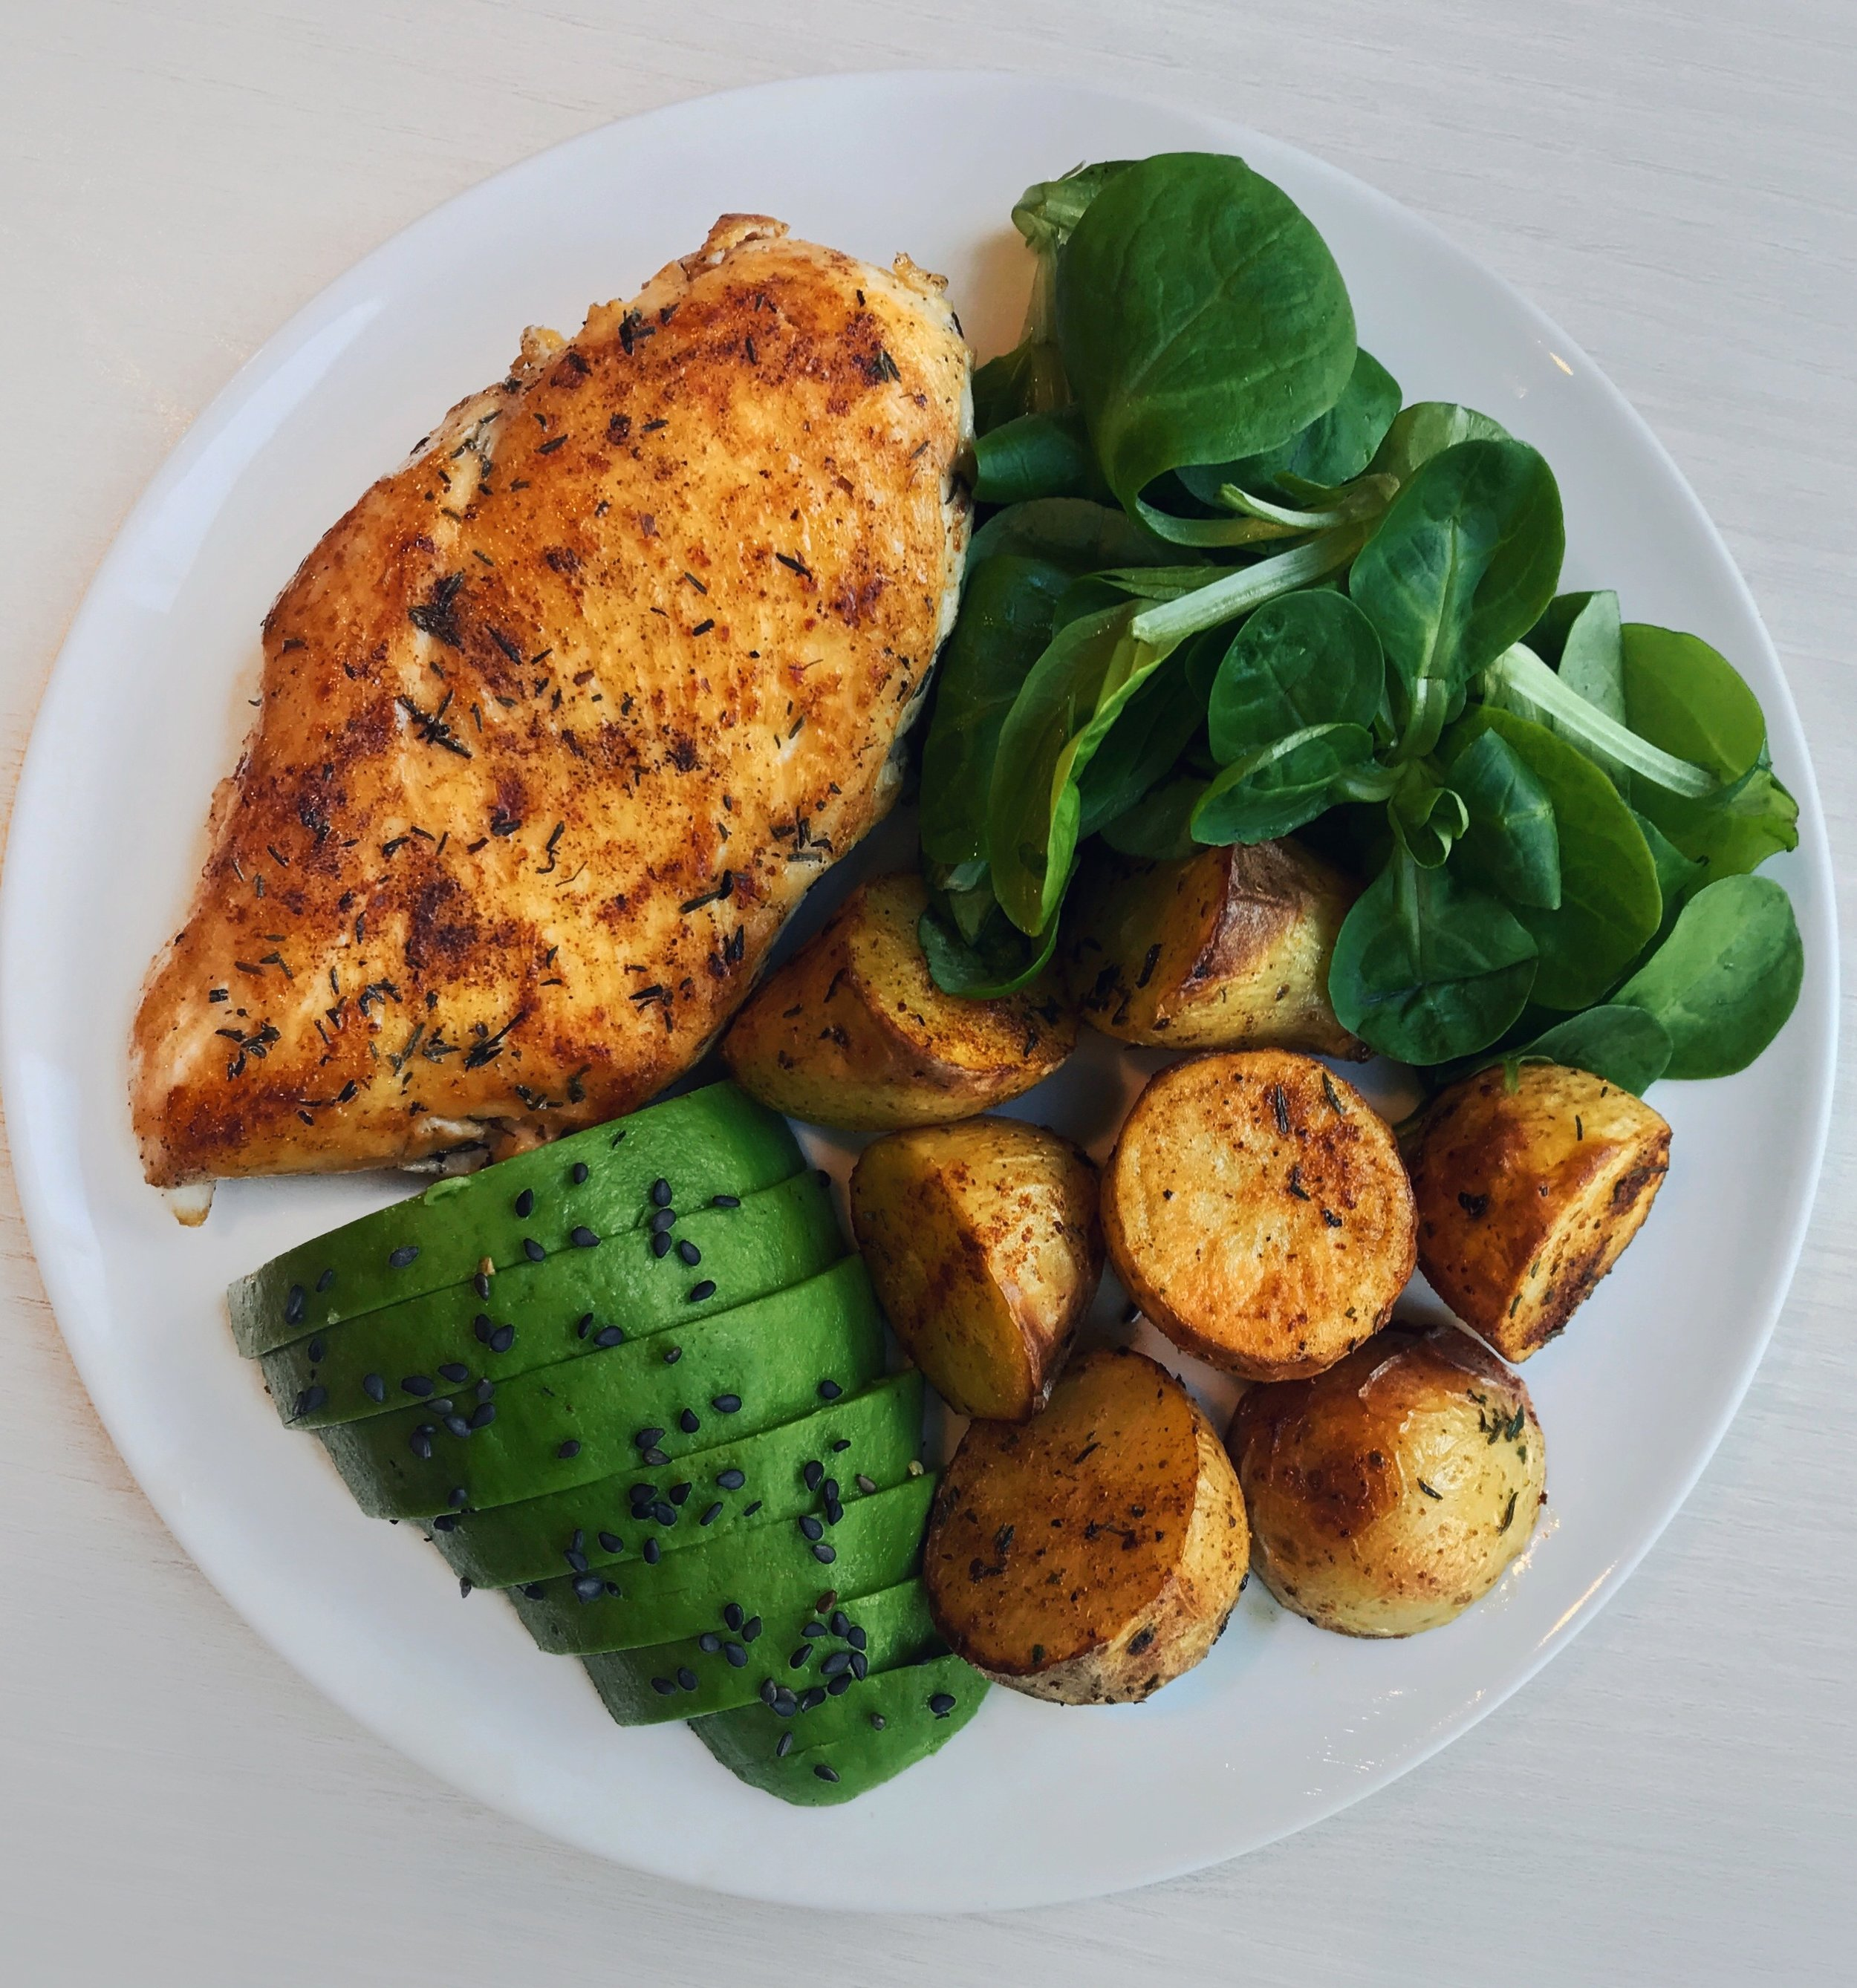 Chicken, Roasted Potatoes, Avocado & Salad